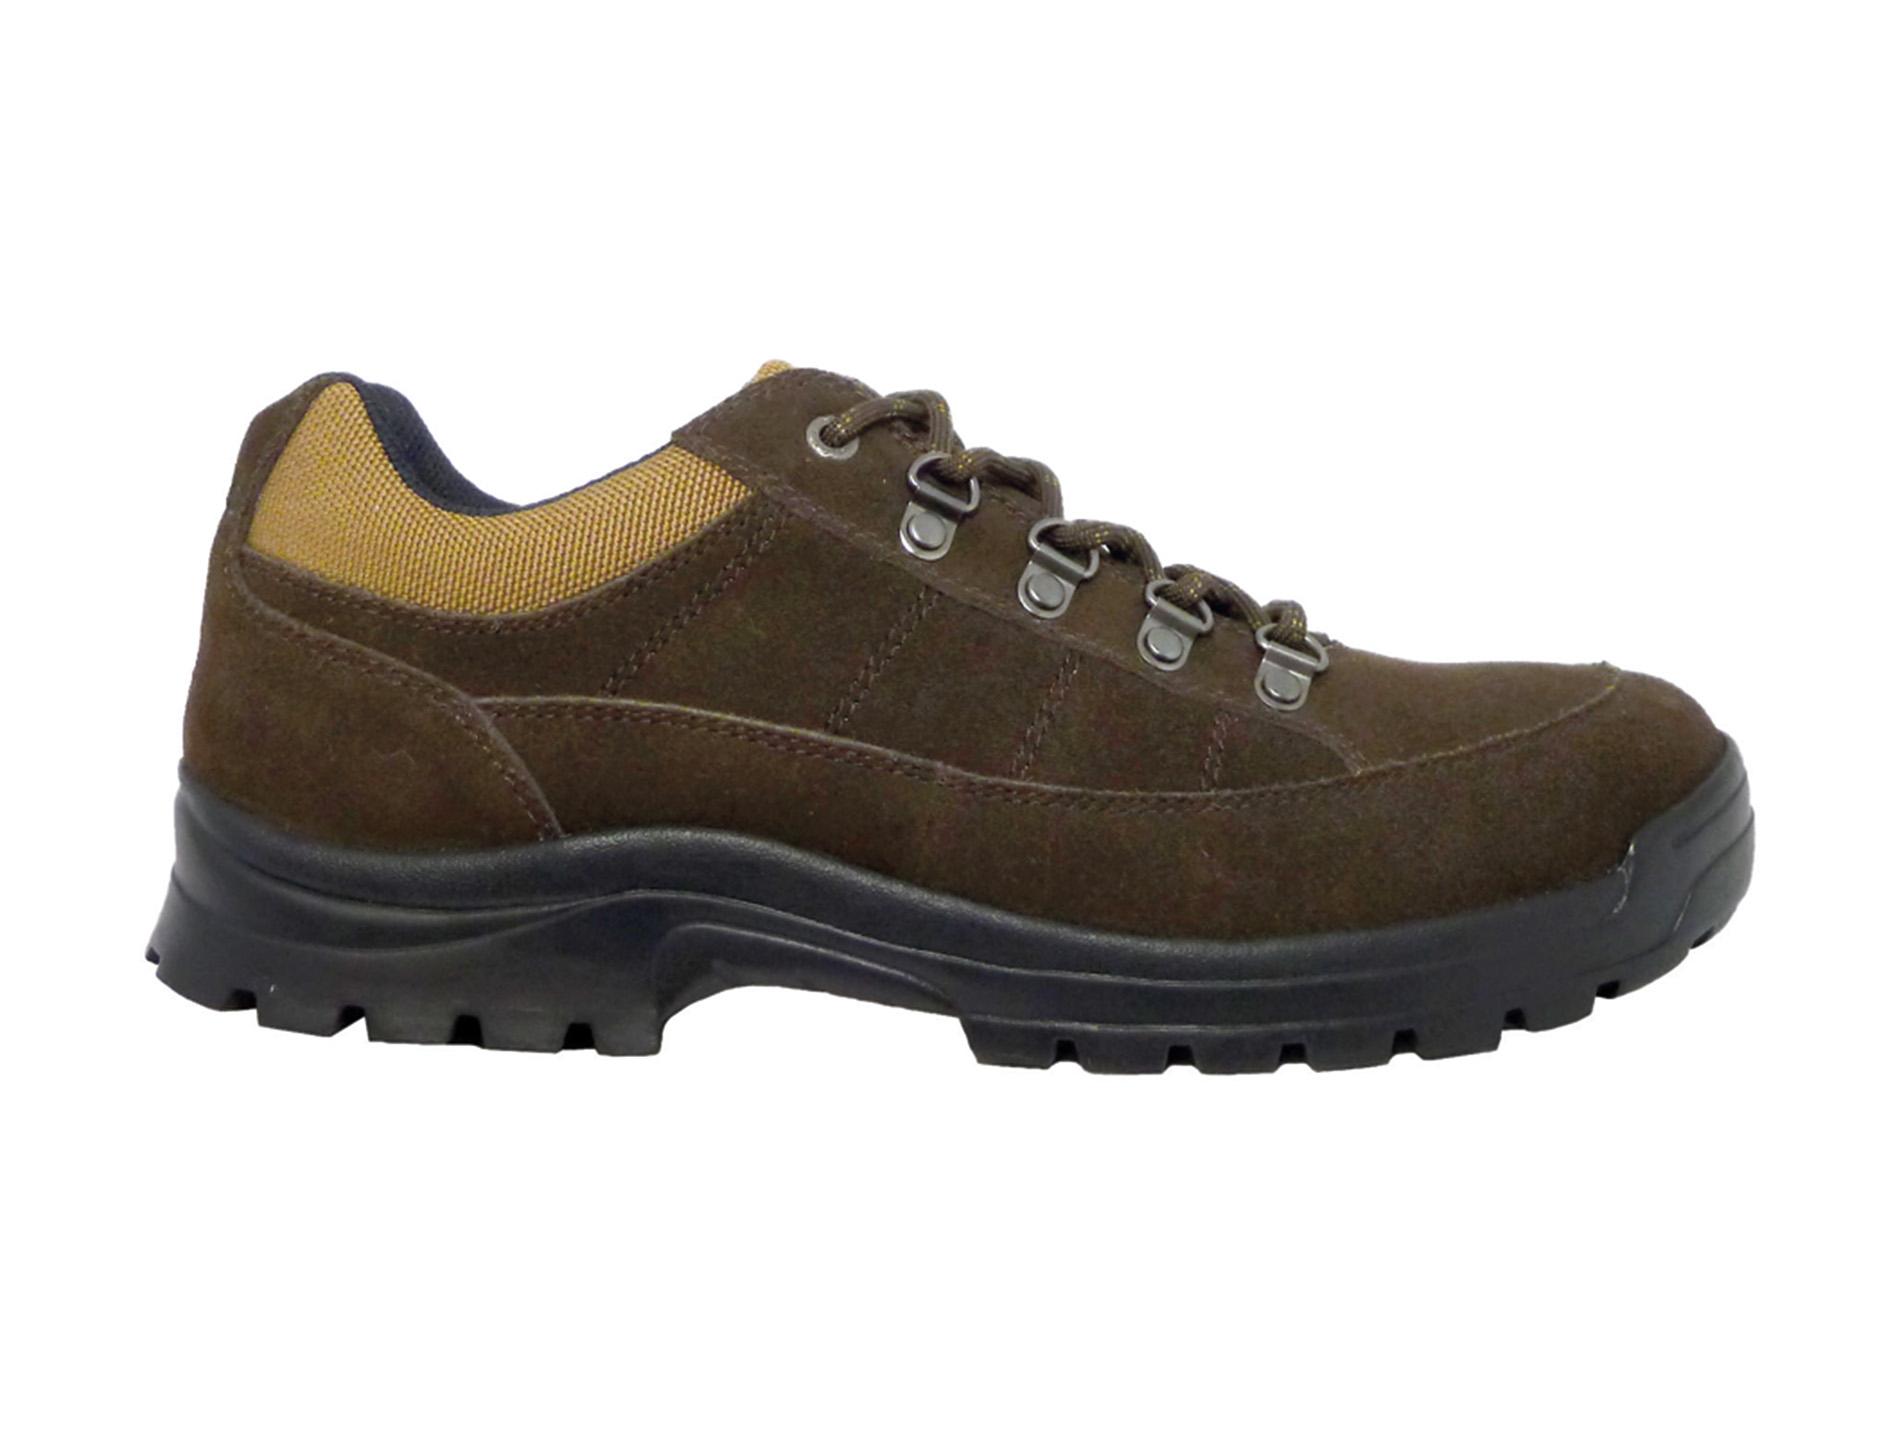 chaussures de travail cuir aigle alten chaussures. Black Bedroom Furniture Sets. Home Design Ideas